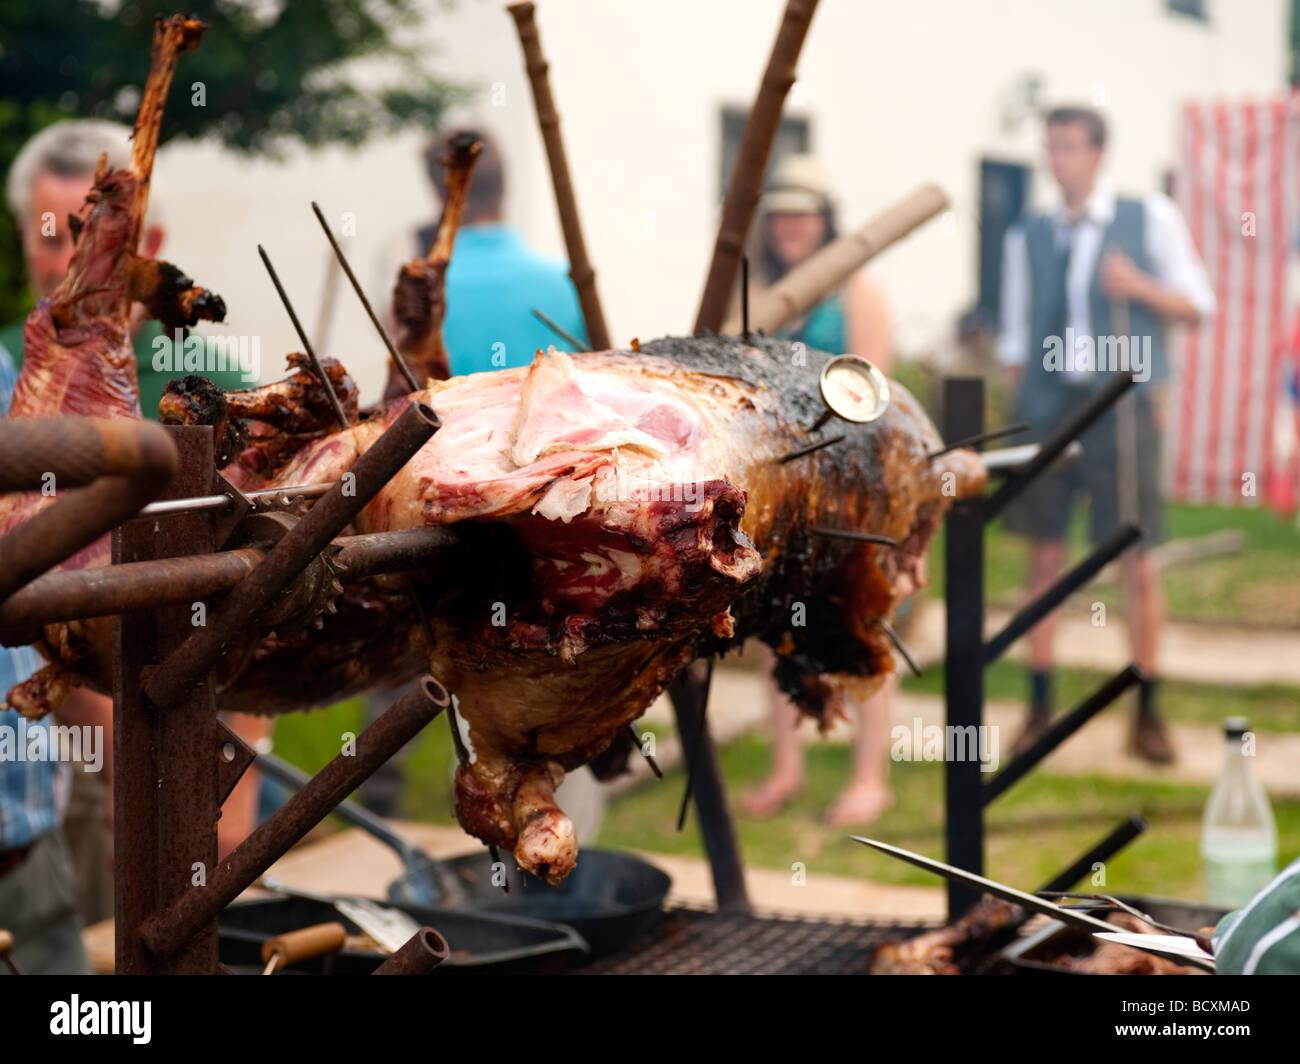 Pig food banquet stockfotos pig food banquet bilder alamy for Kochen temperatur